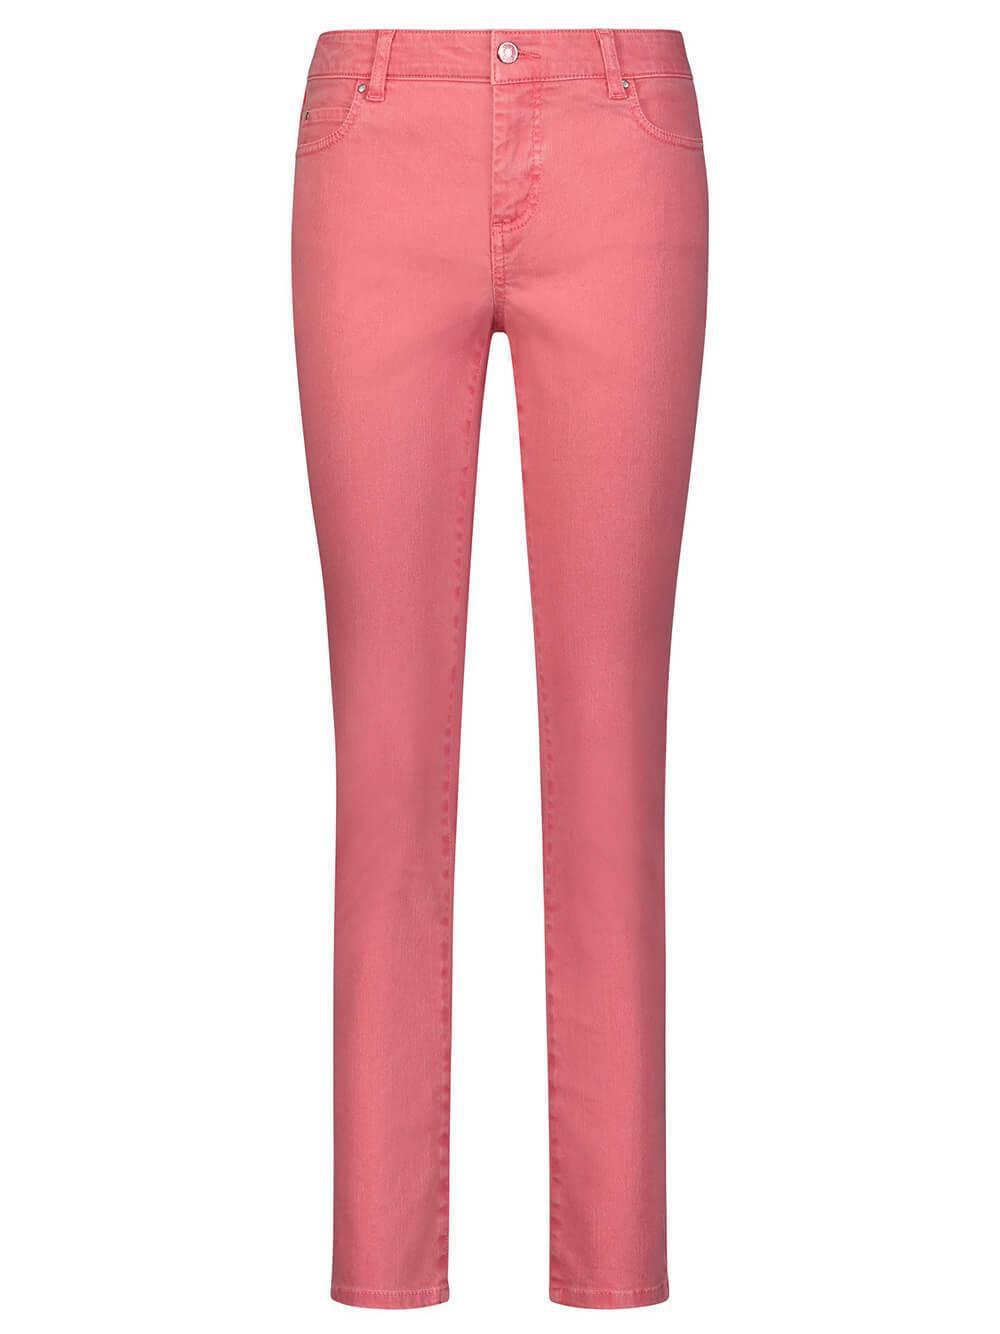 Melrose 5 Pocket Slim Jean Item # 1234DD-S21